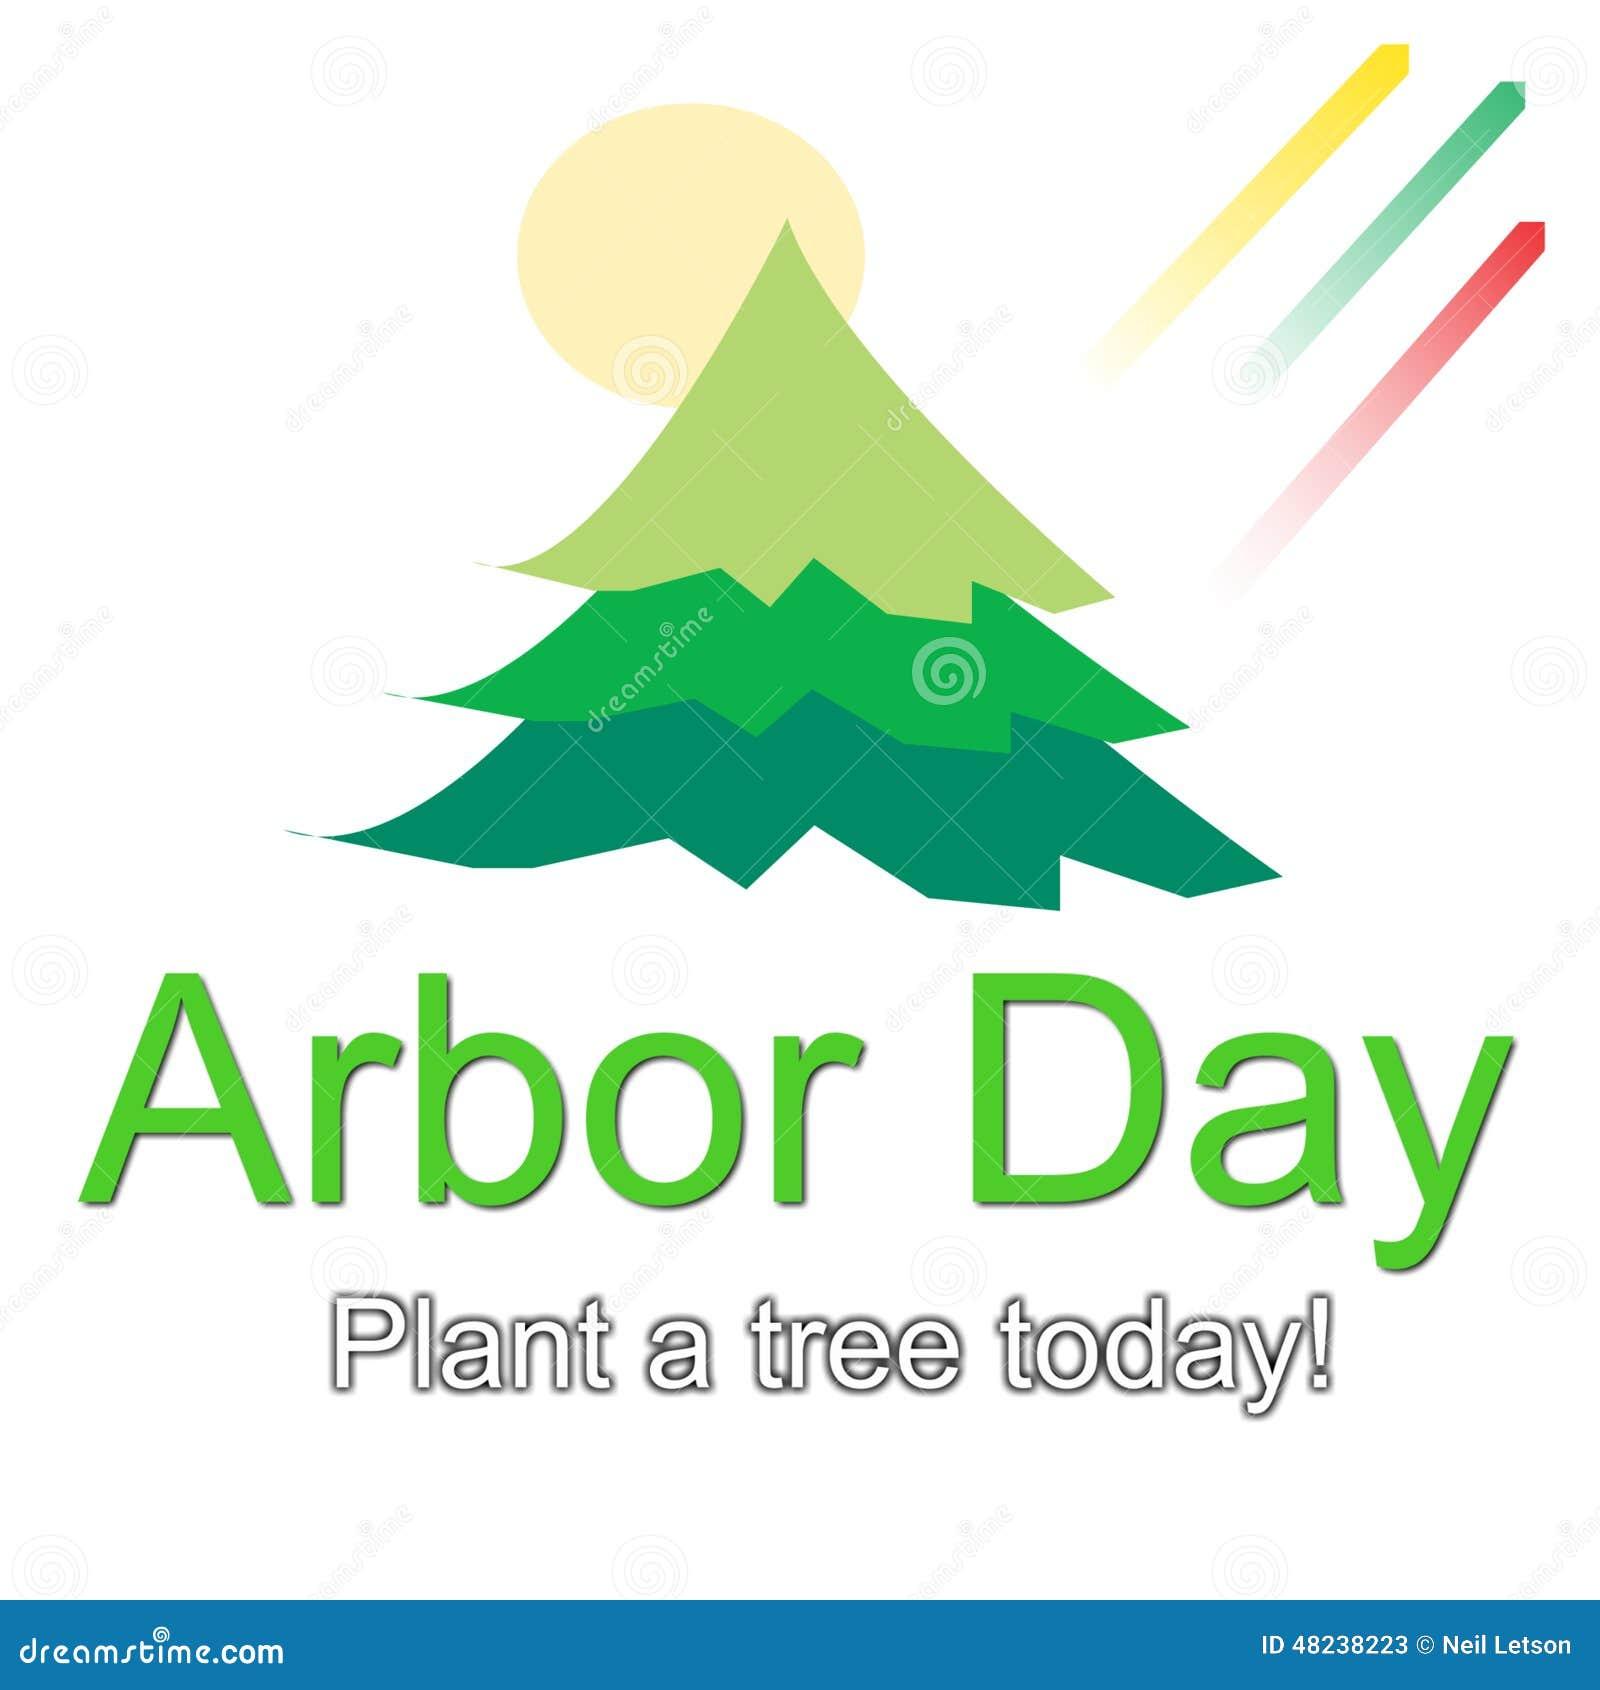 Arbor Day Logo Illustration